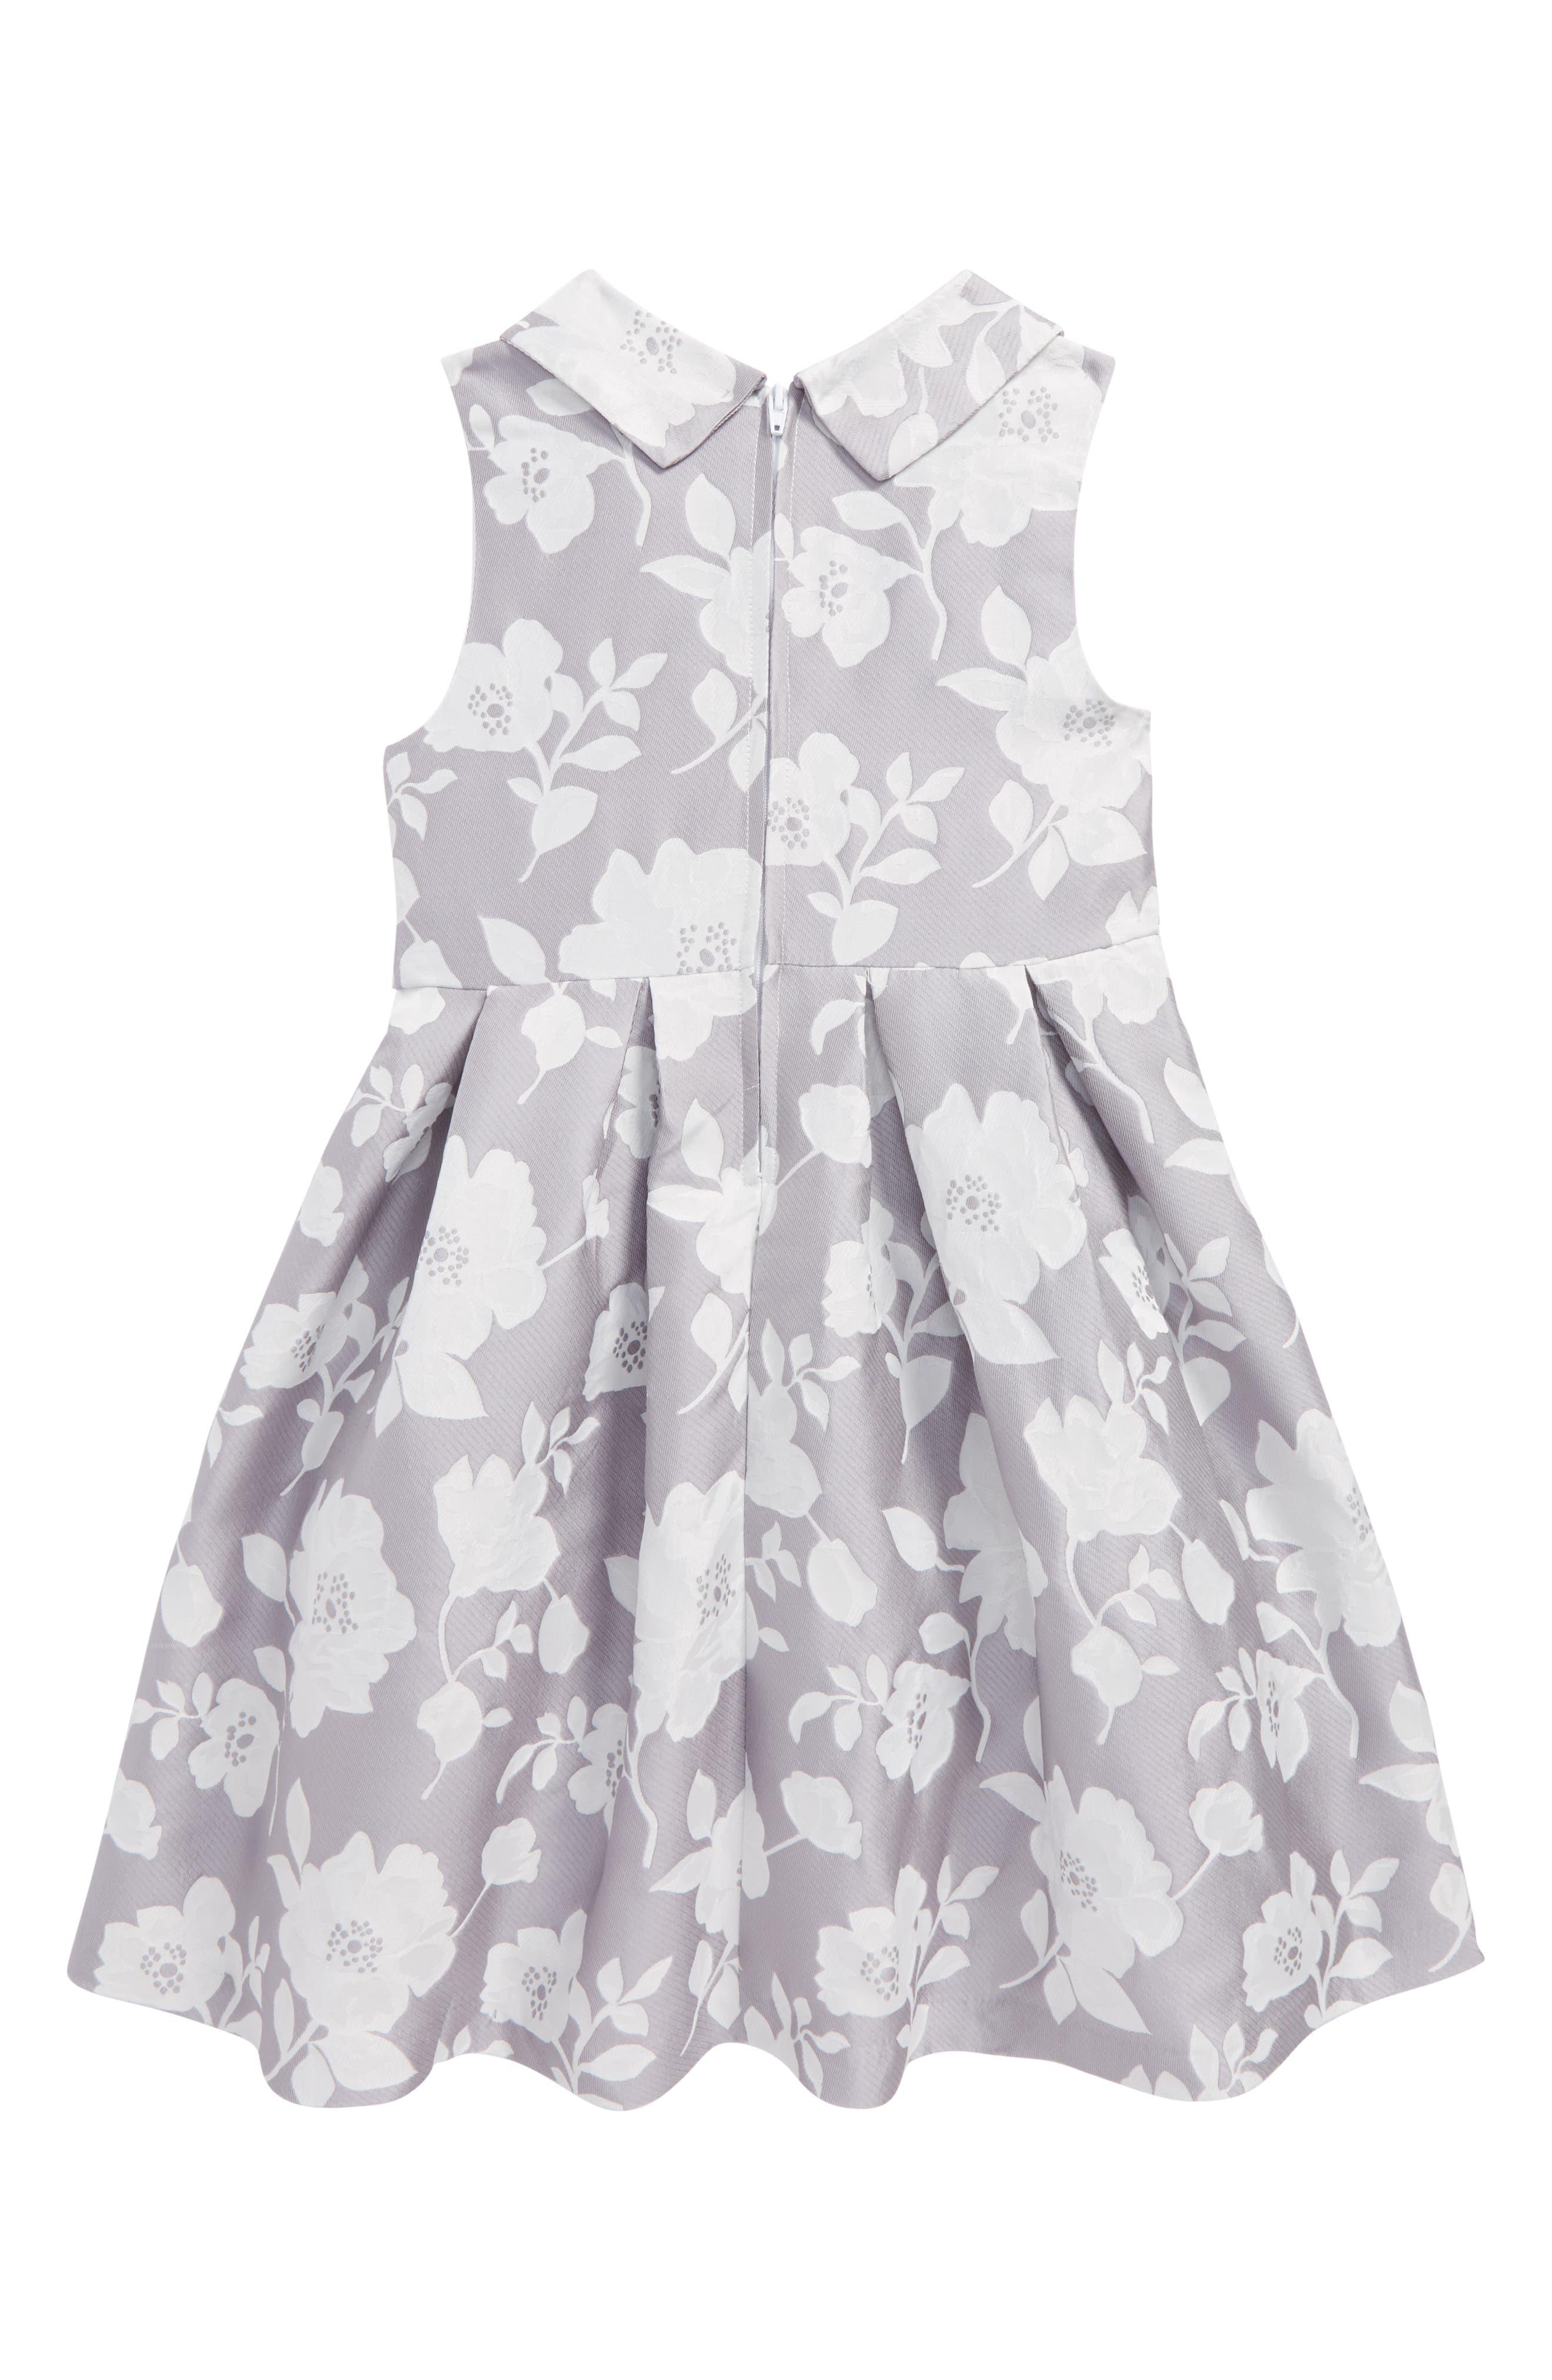 Floral Jacquard Dress,                             Alternate thumbnail 2, color,                             020